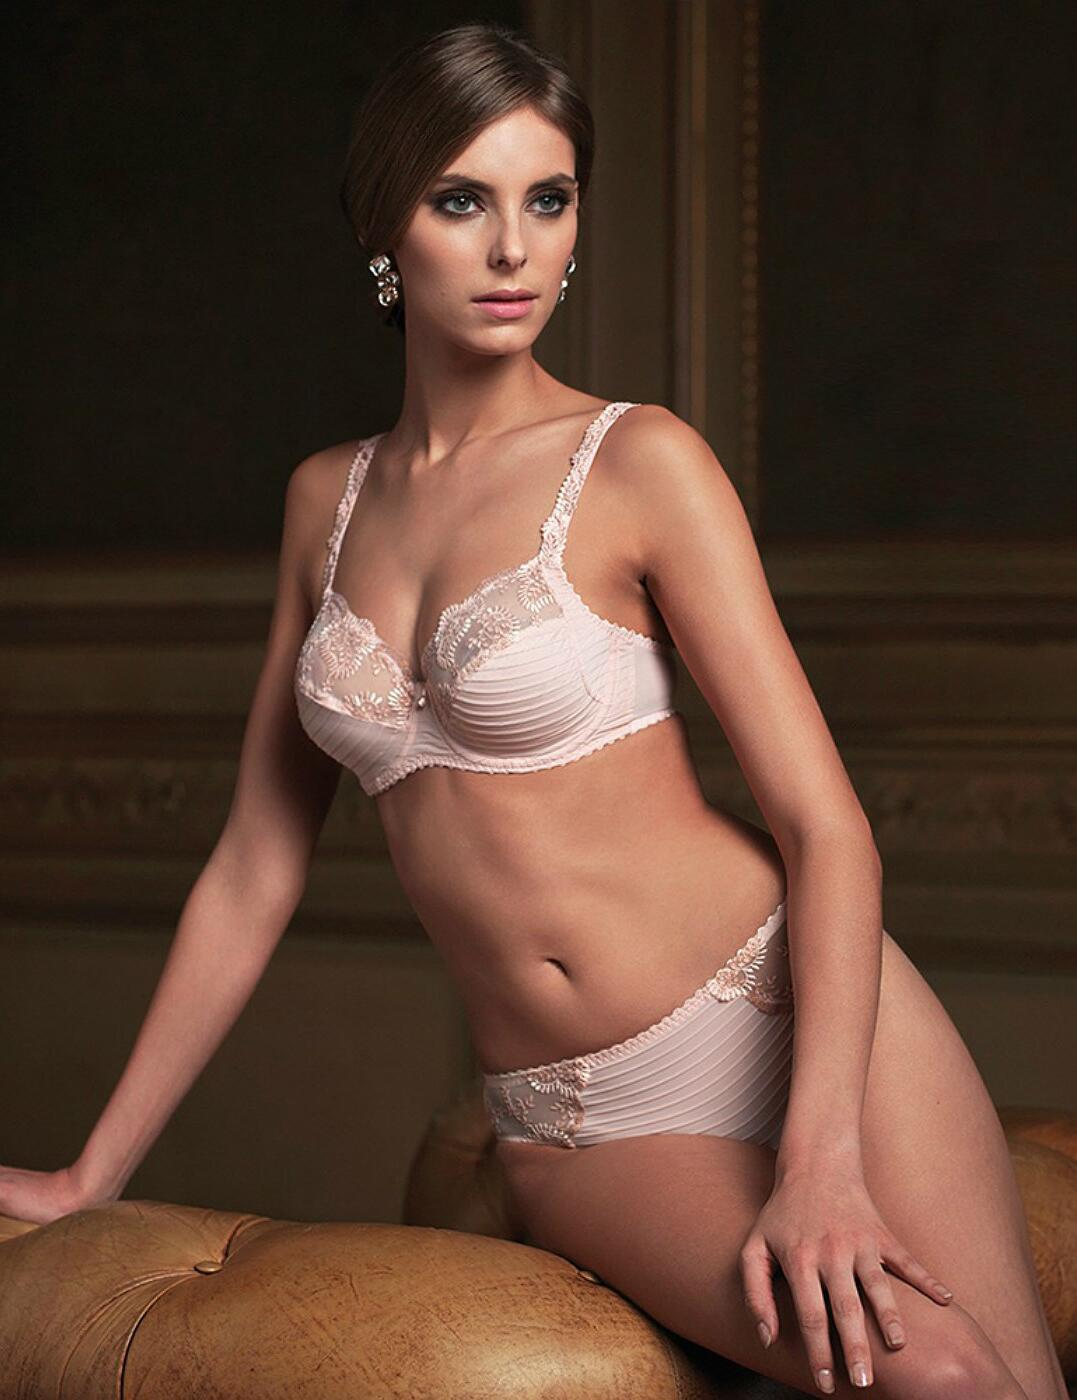 41901 Louisa Bracq Elise Full Cup Bra - 41901 Nude Rose